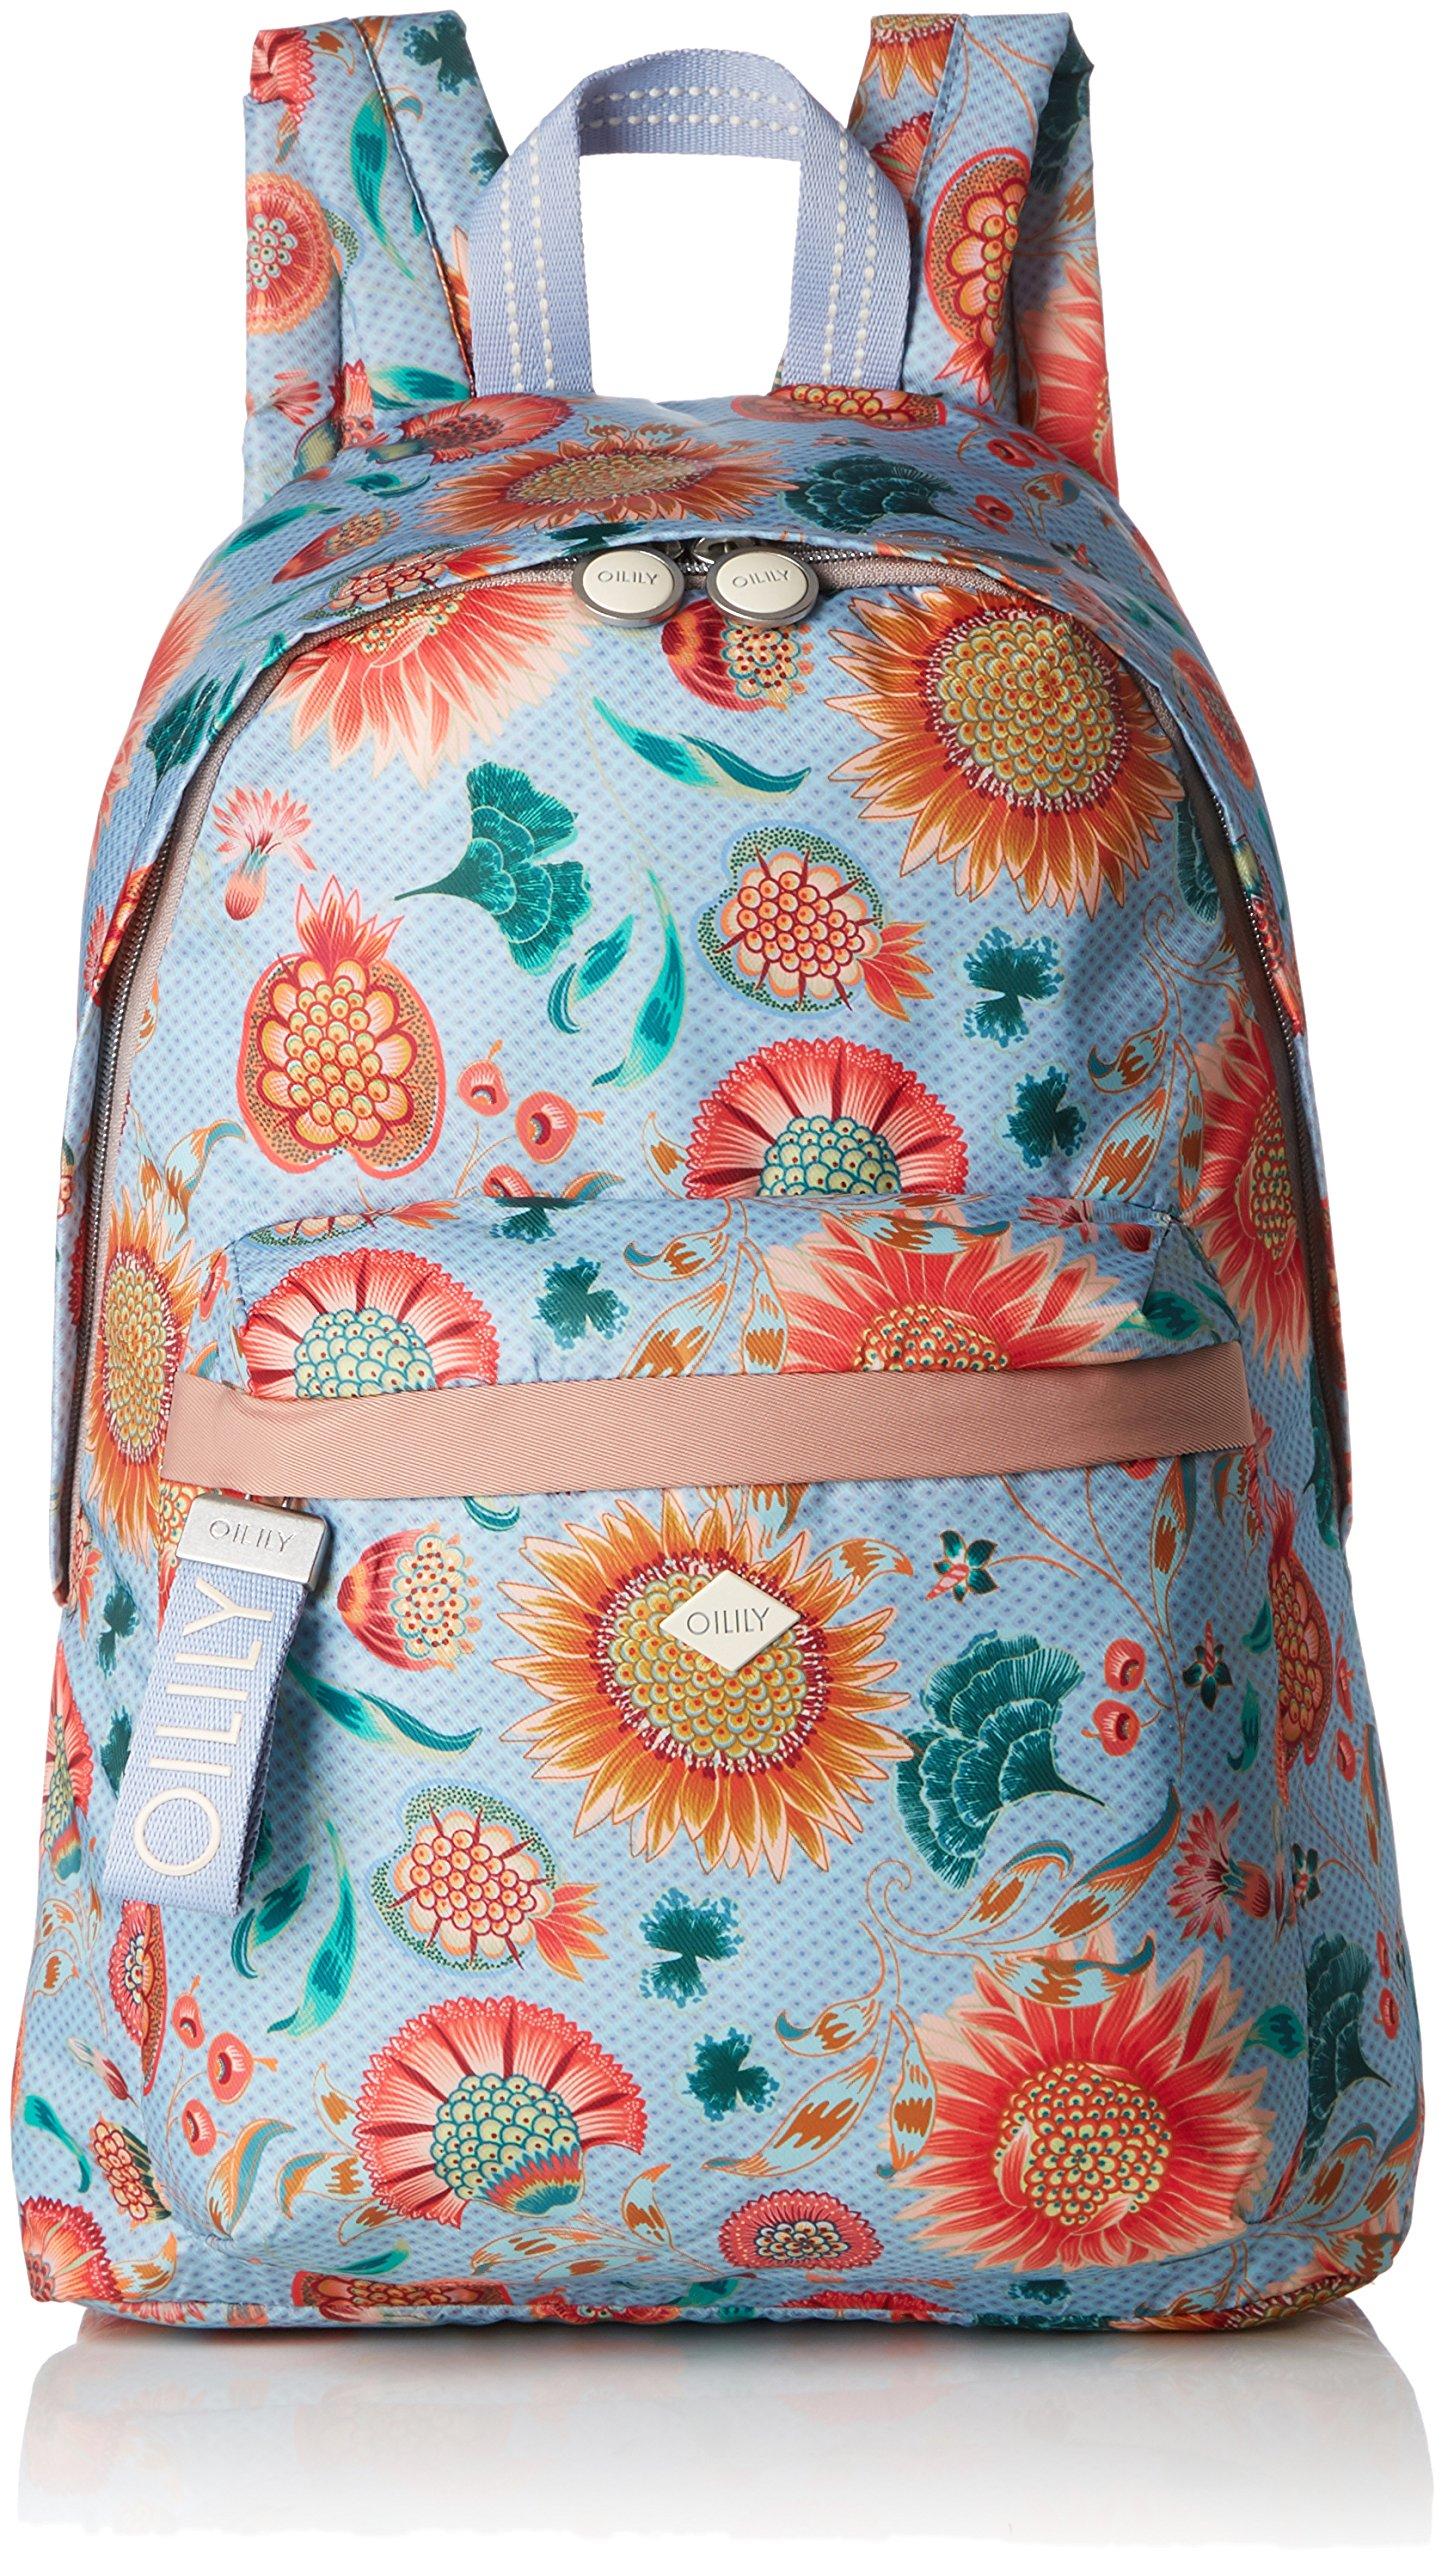 Oilily Sunflower FemmeBleulight Portés T Groovy H Cmb X Backpack LvzSacs Blue15x40x28 Dos rCBoQdeExW